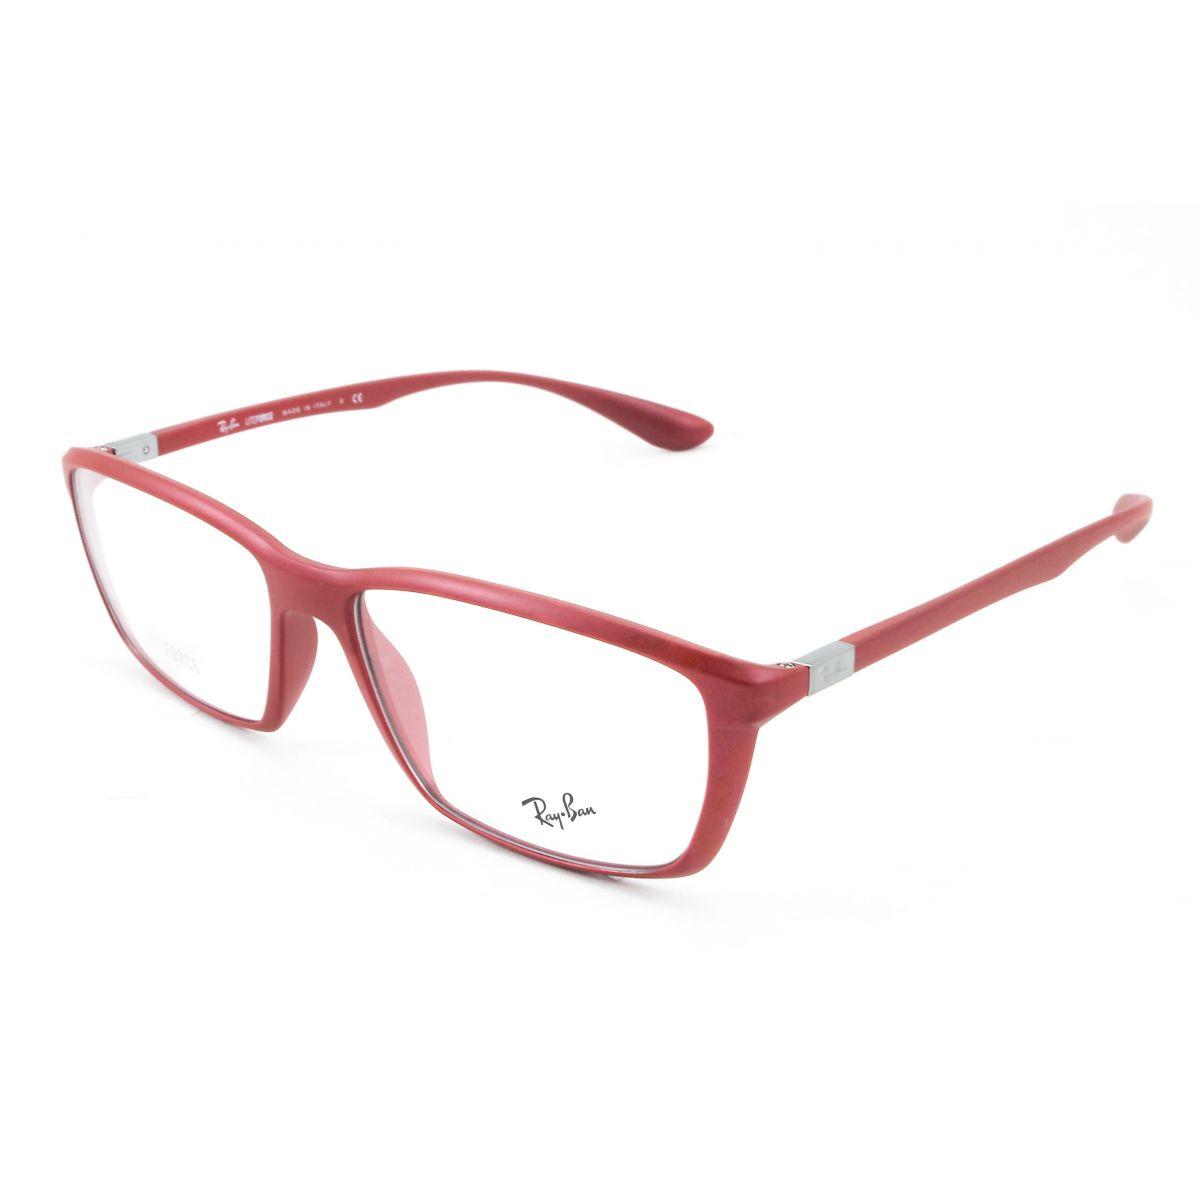 Oculos Ray Ban Vermelho De Grau   Louisiana Bucket Brigade 21ddb15a8e